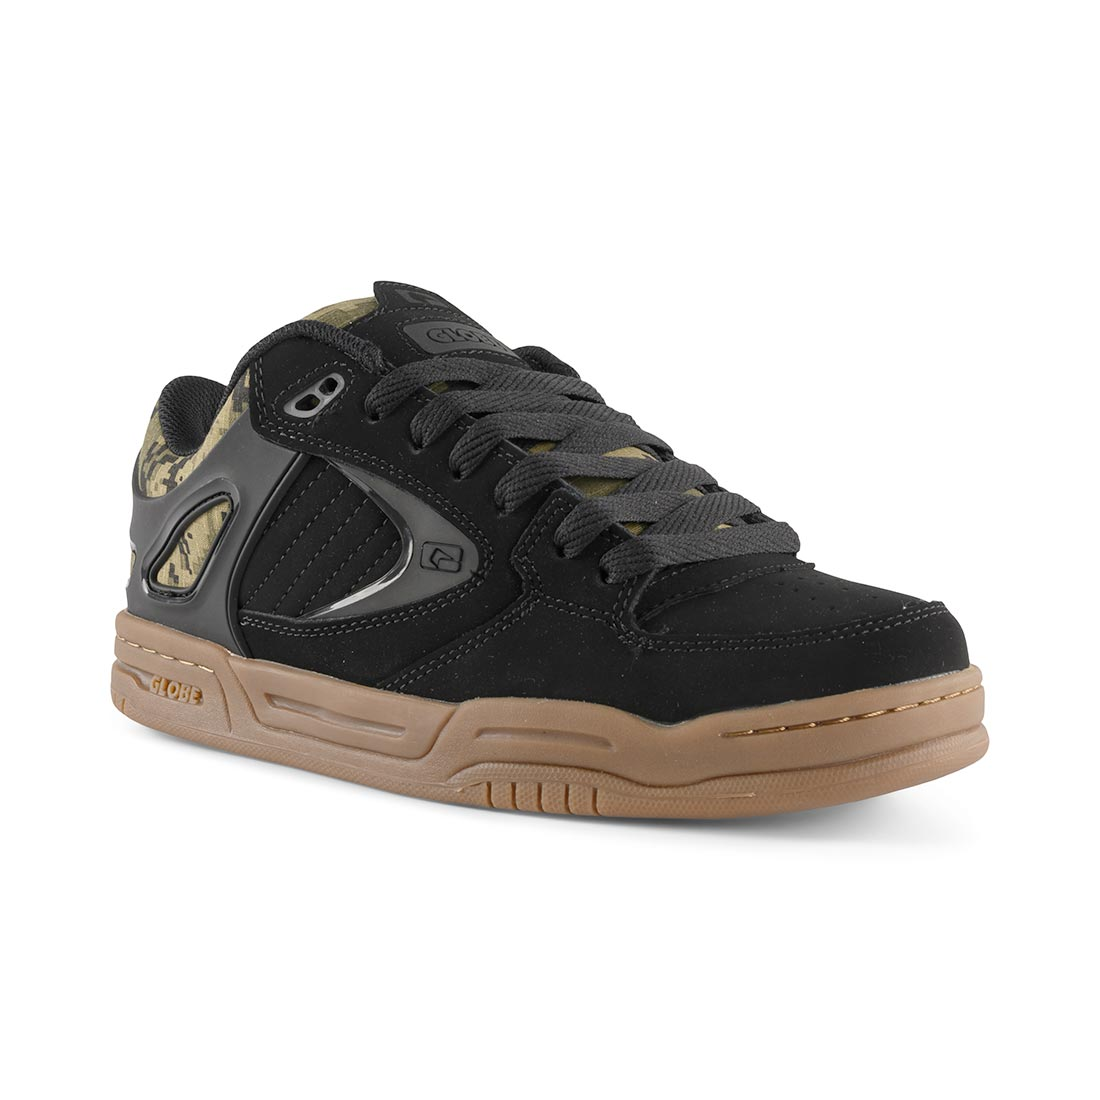 Globe Agent Shoes - Black / Black / Camo